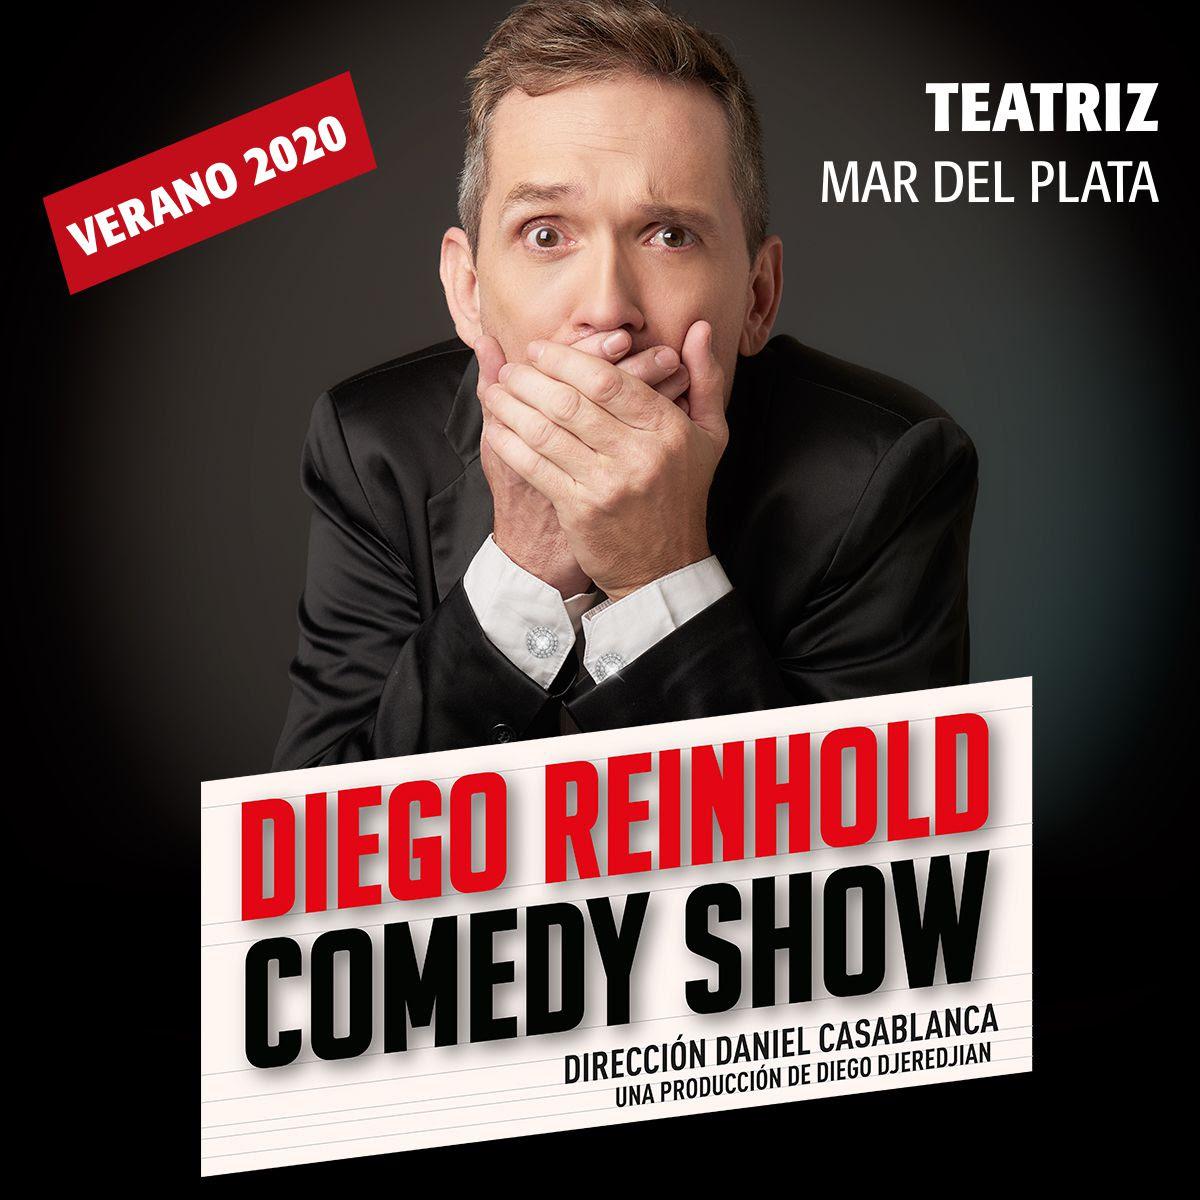 Diego Reinhold llega con su Comedy Show a Mar del Plata